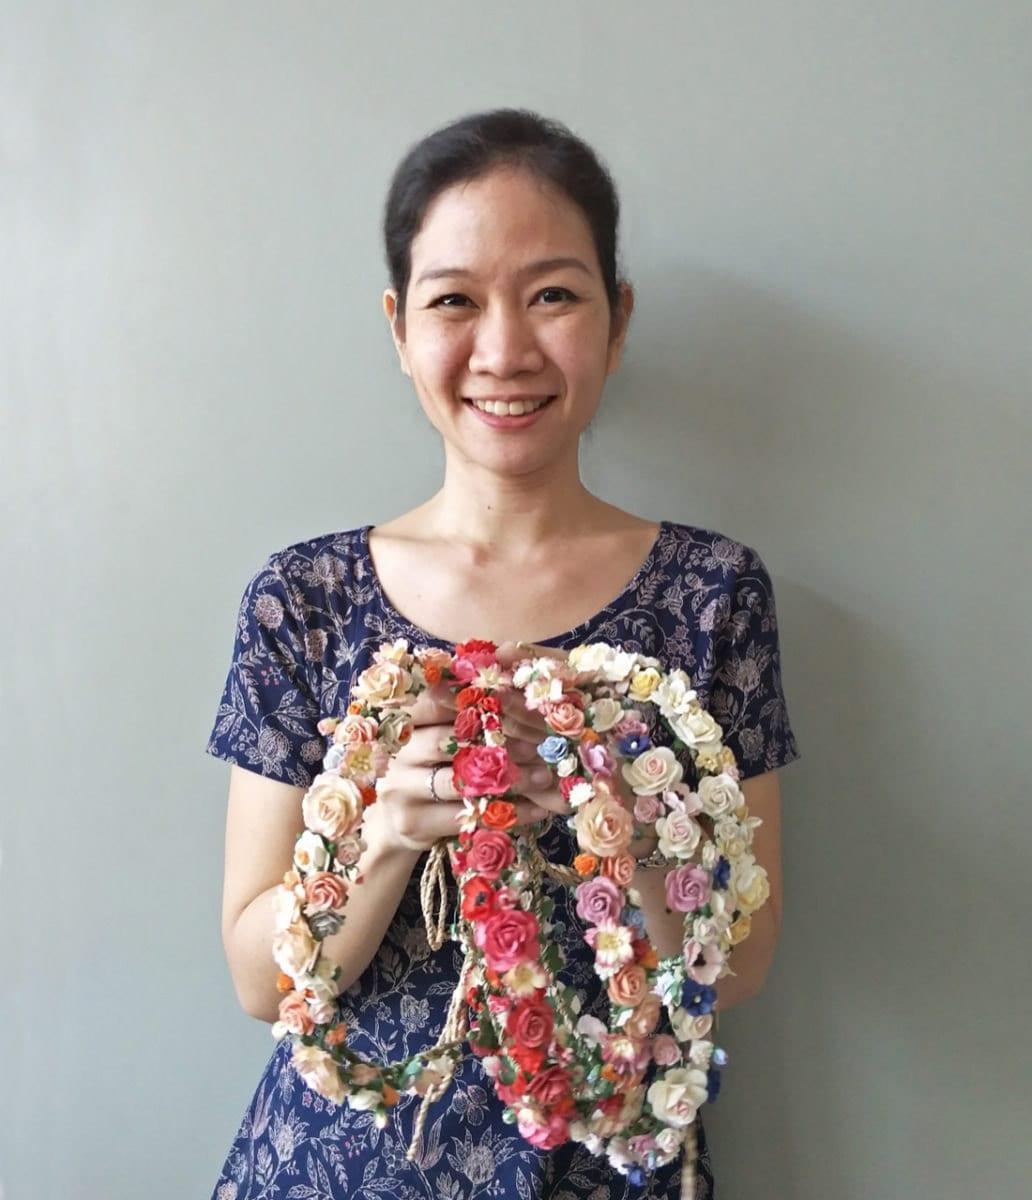 Portrait of Squish-n-Chips owner Orawee Choedamphai